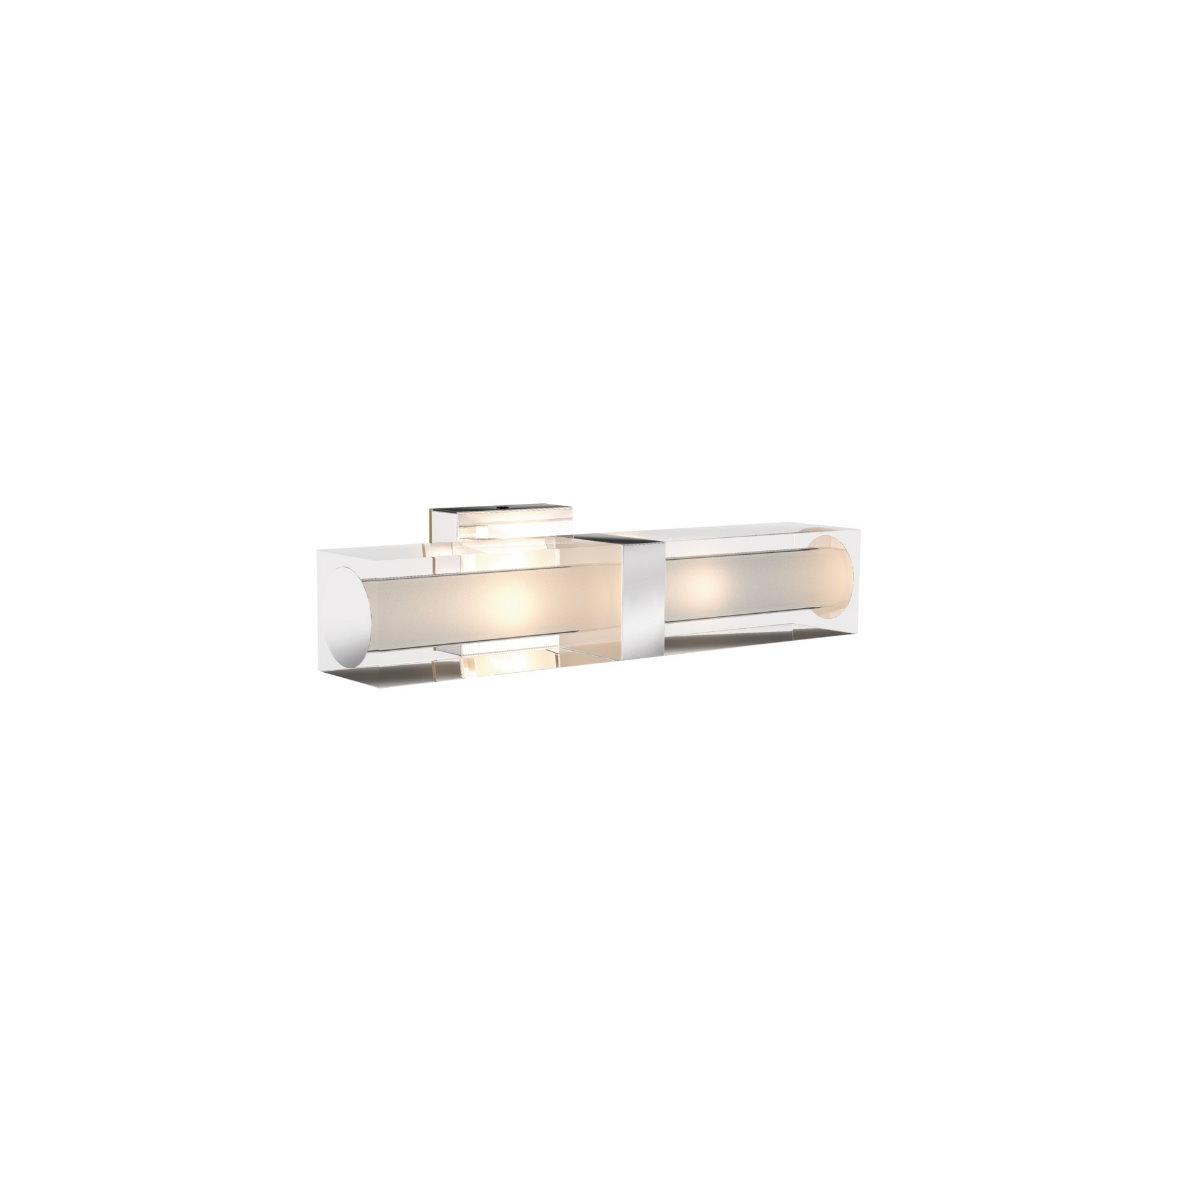 wandleuchte feuchtraum bad wand strahler wandstrahler leuchte ip44 lampe g9 t5 ebay. Black Bedroom Furniture Sets. Home Design Ideas